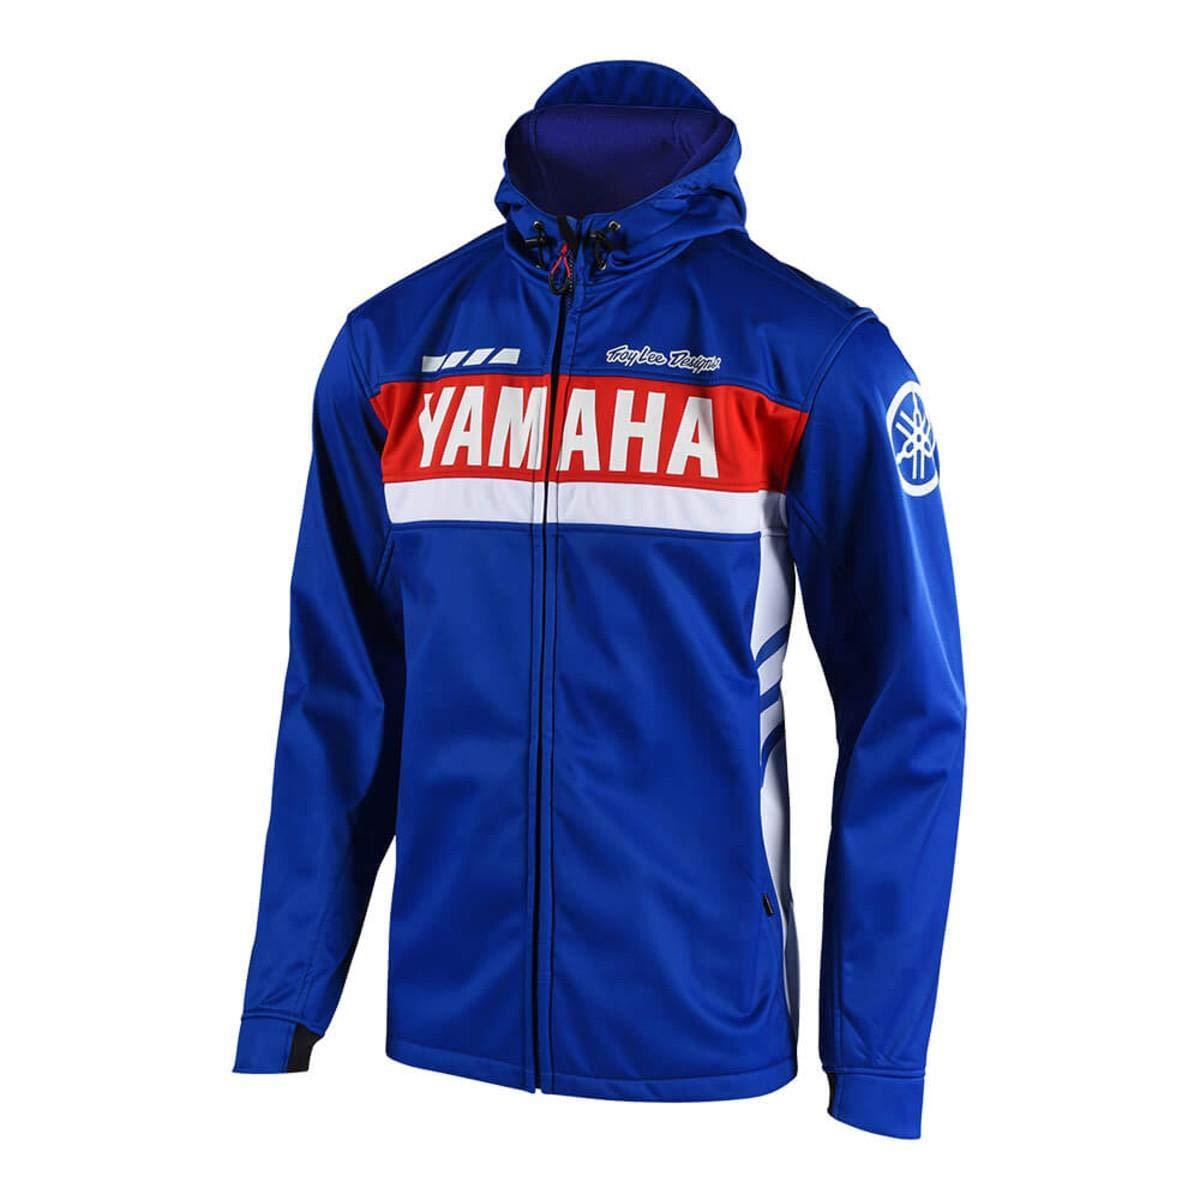 3cc245c23 Amazon.com: Troy Lee Designs 2018 Yamaha RS1 Tech Jacket-L: Clothing